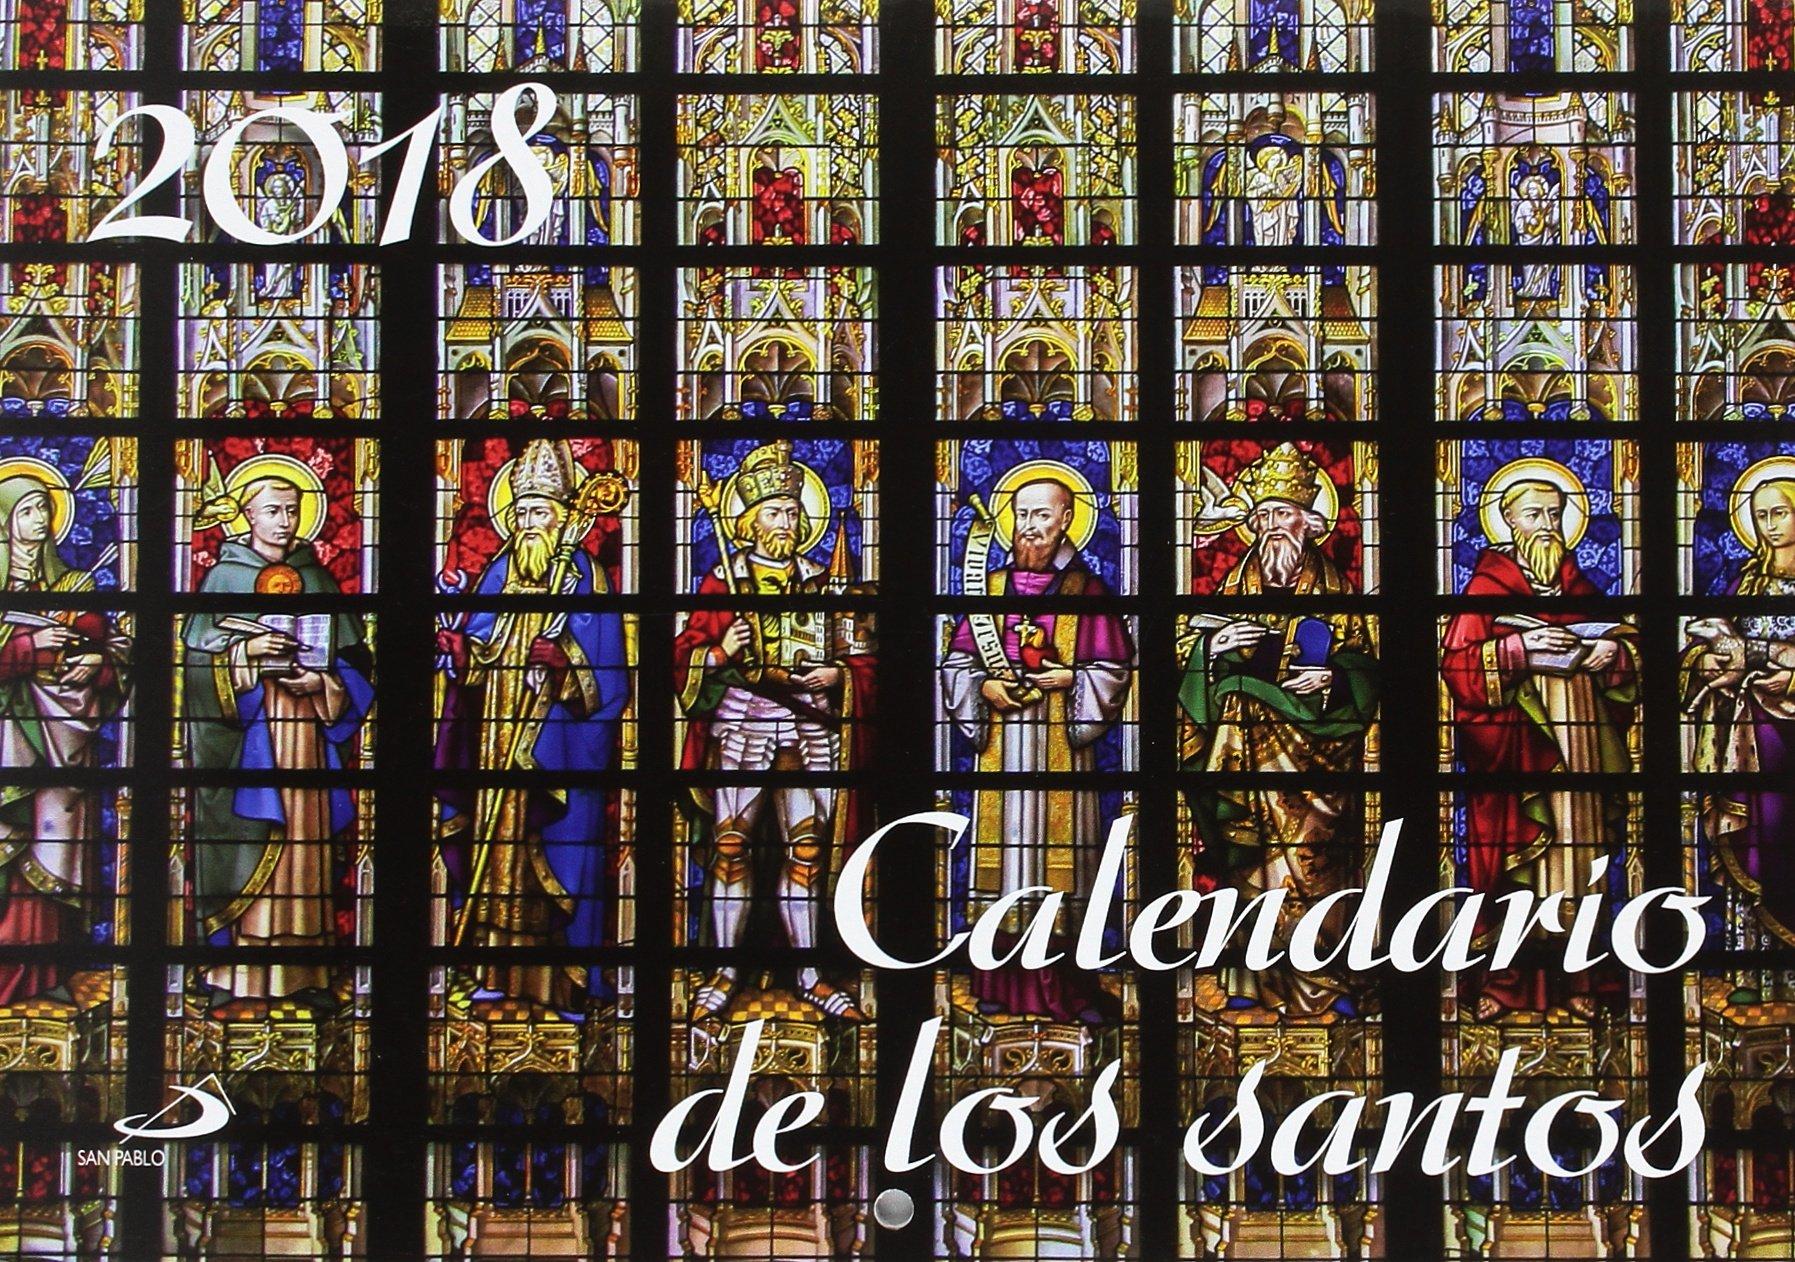 Calendario Santos.Calendario De Los Santos 2018 9788428553469 Amazon Com Books